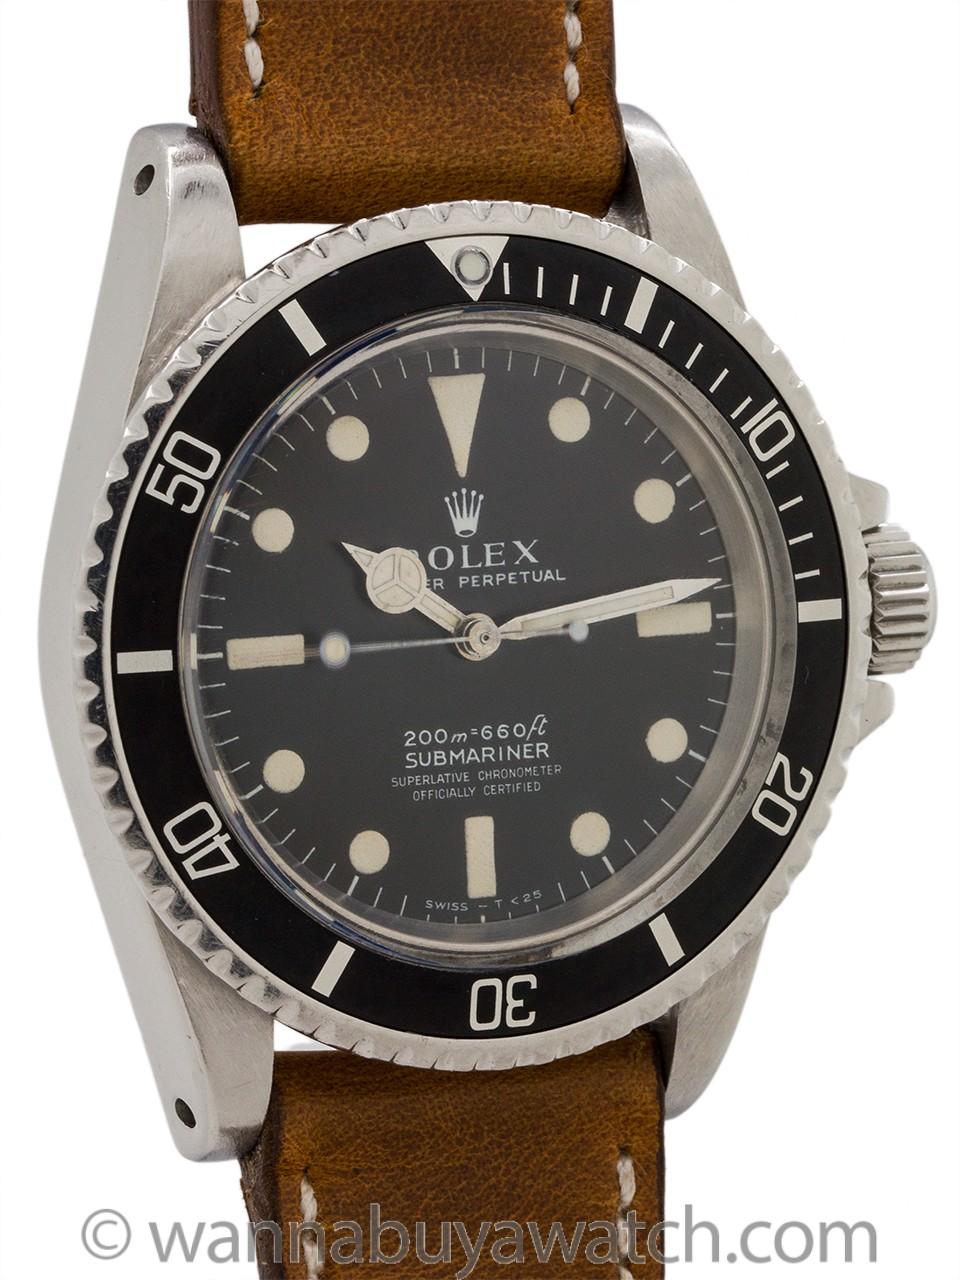 Rolex Submariner ref 5512 Meters First circa 1969